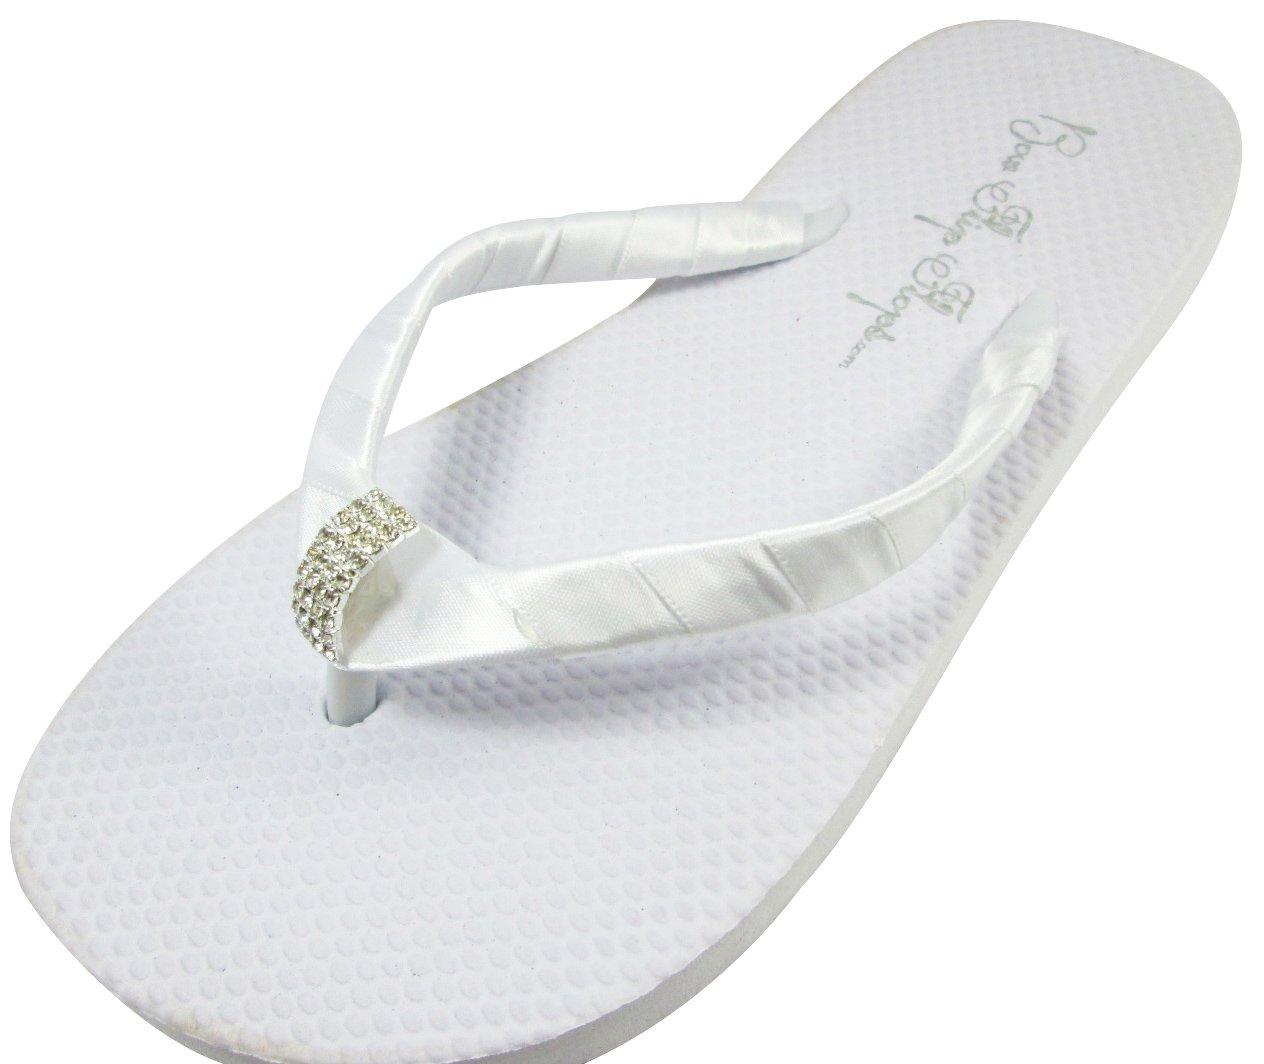 0937a41796bdf Amazon.com  Bridal Flip Flops Wedding White Flat Bride Emerald Cut Jewel  Satin Rhinestone Flip Flops  Handmade